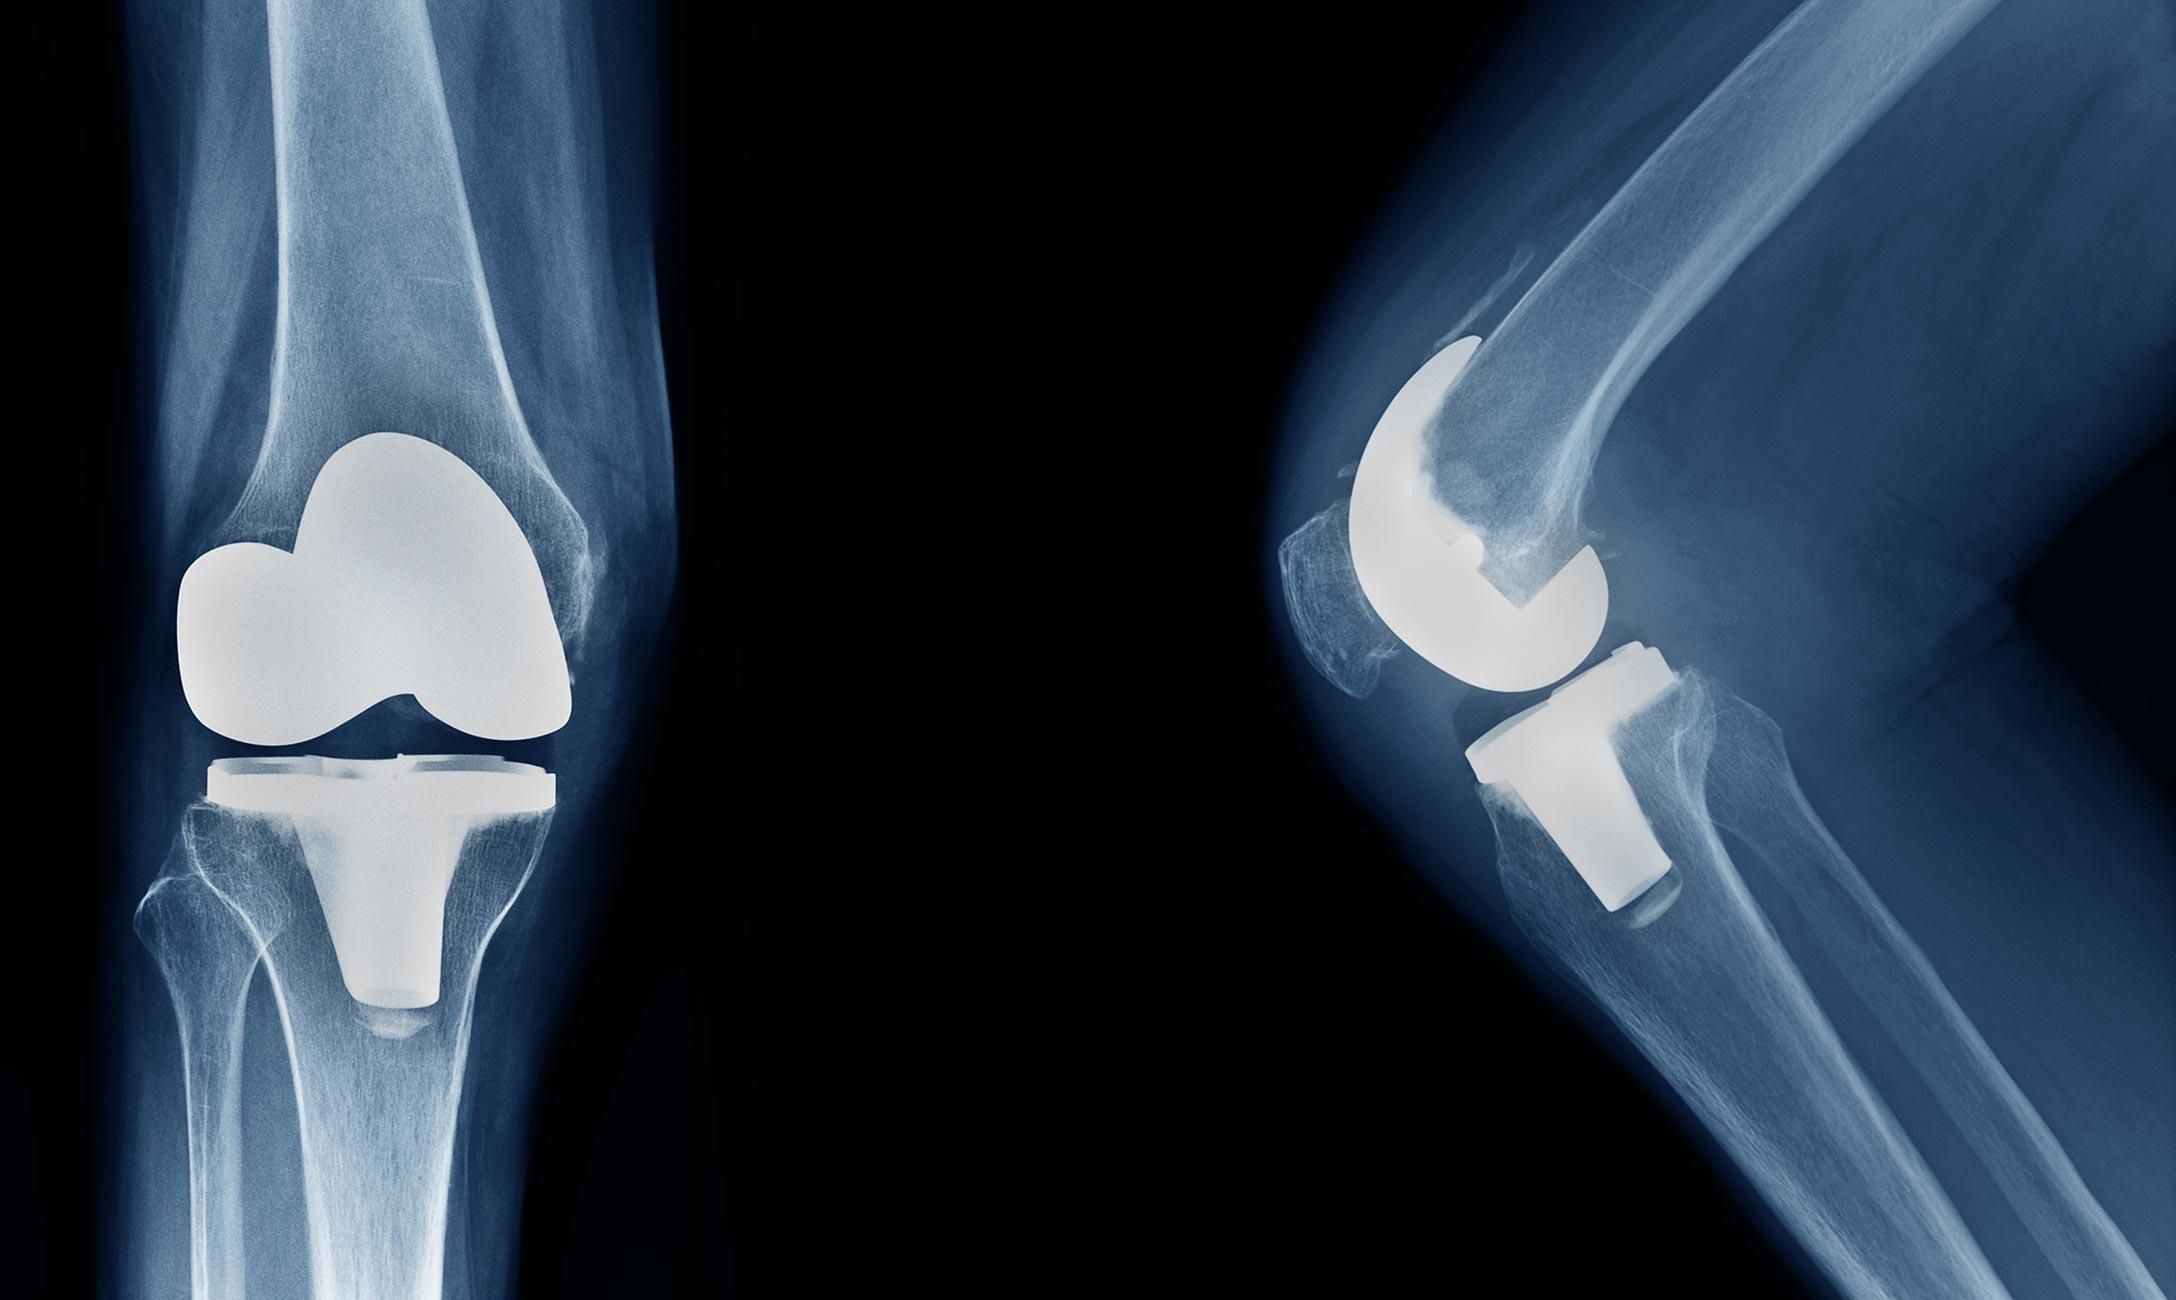 X-ray of knee implants.